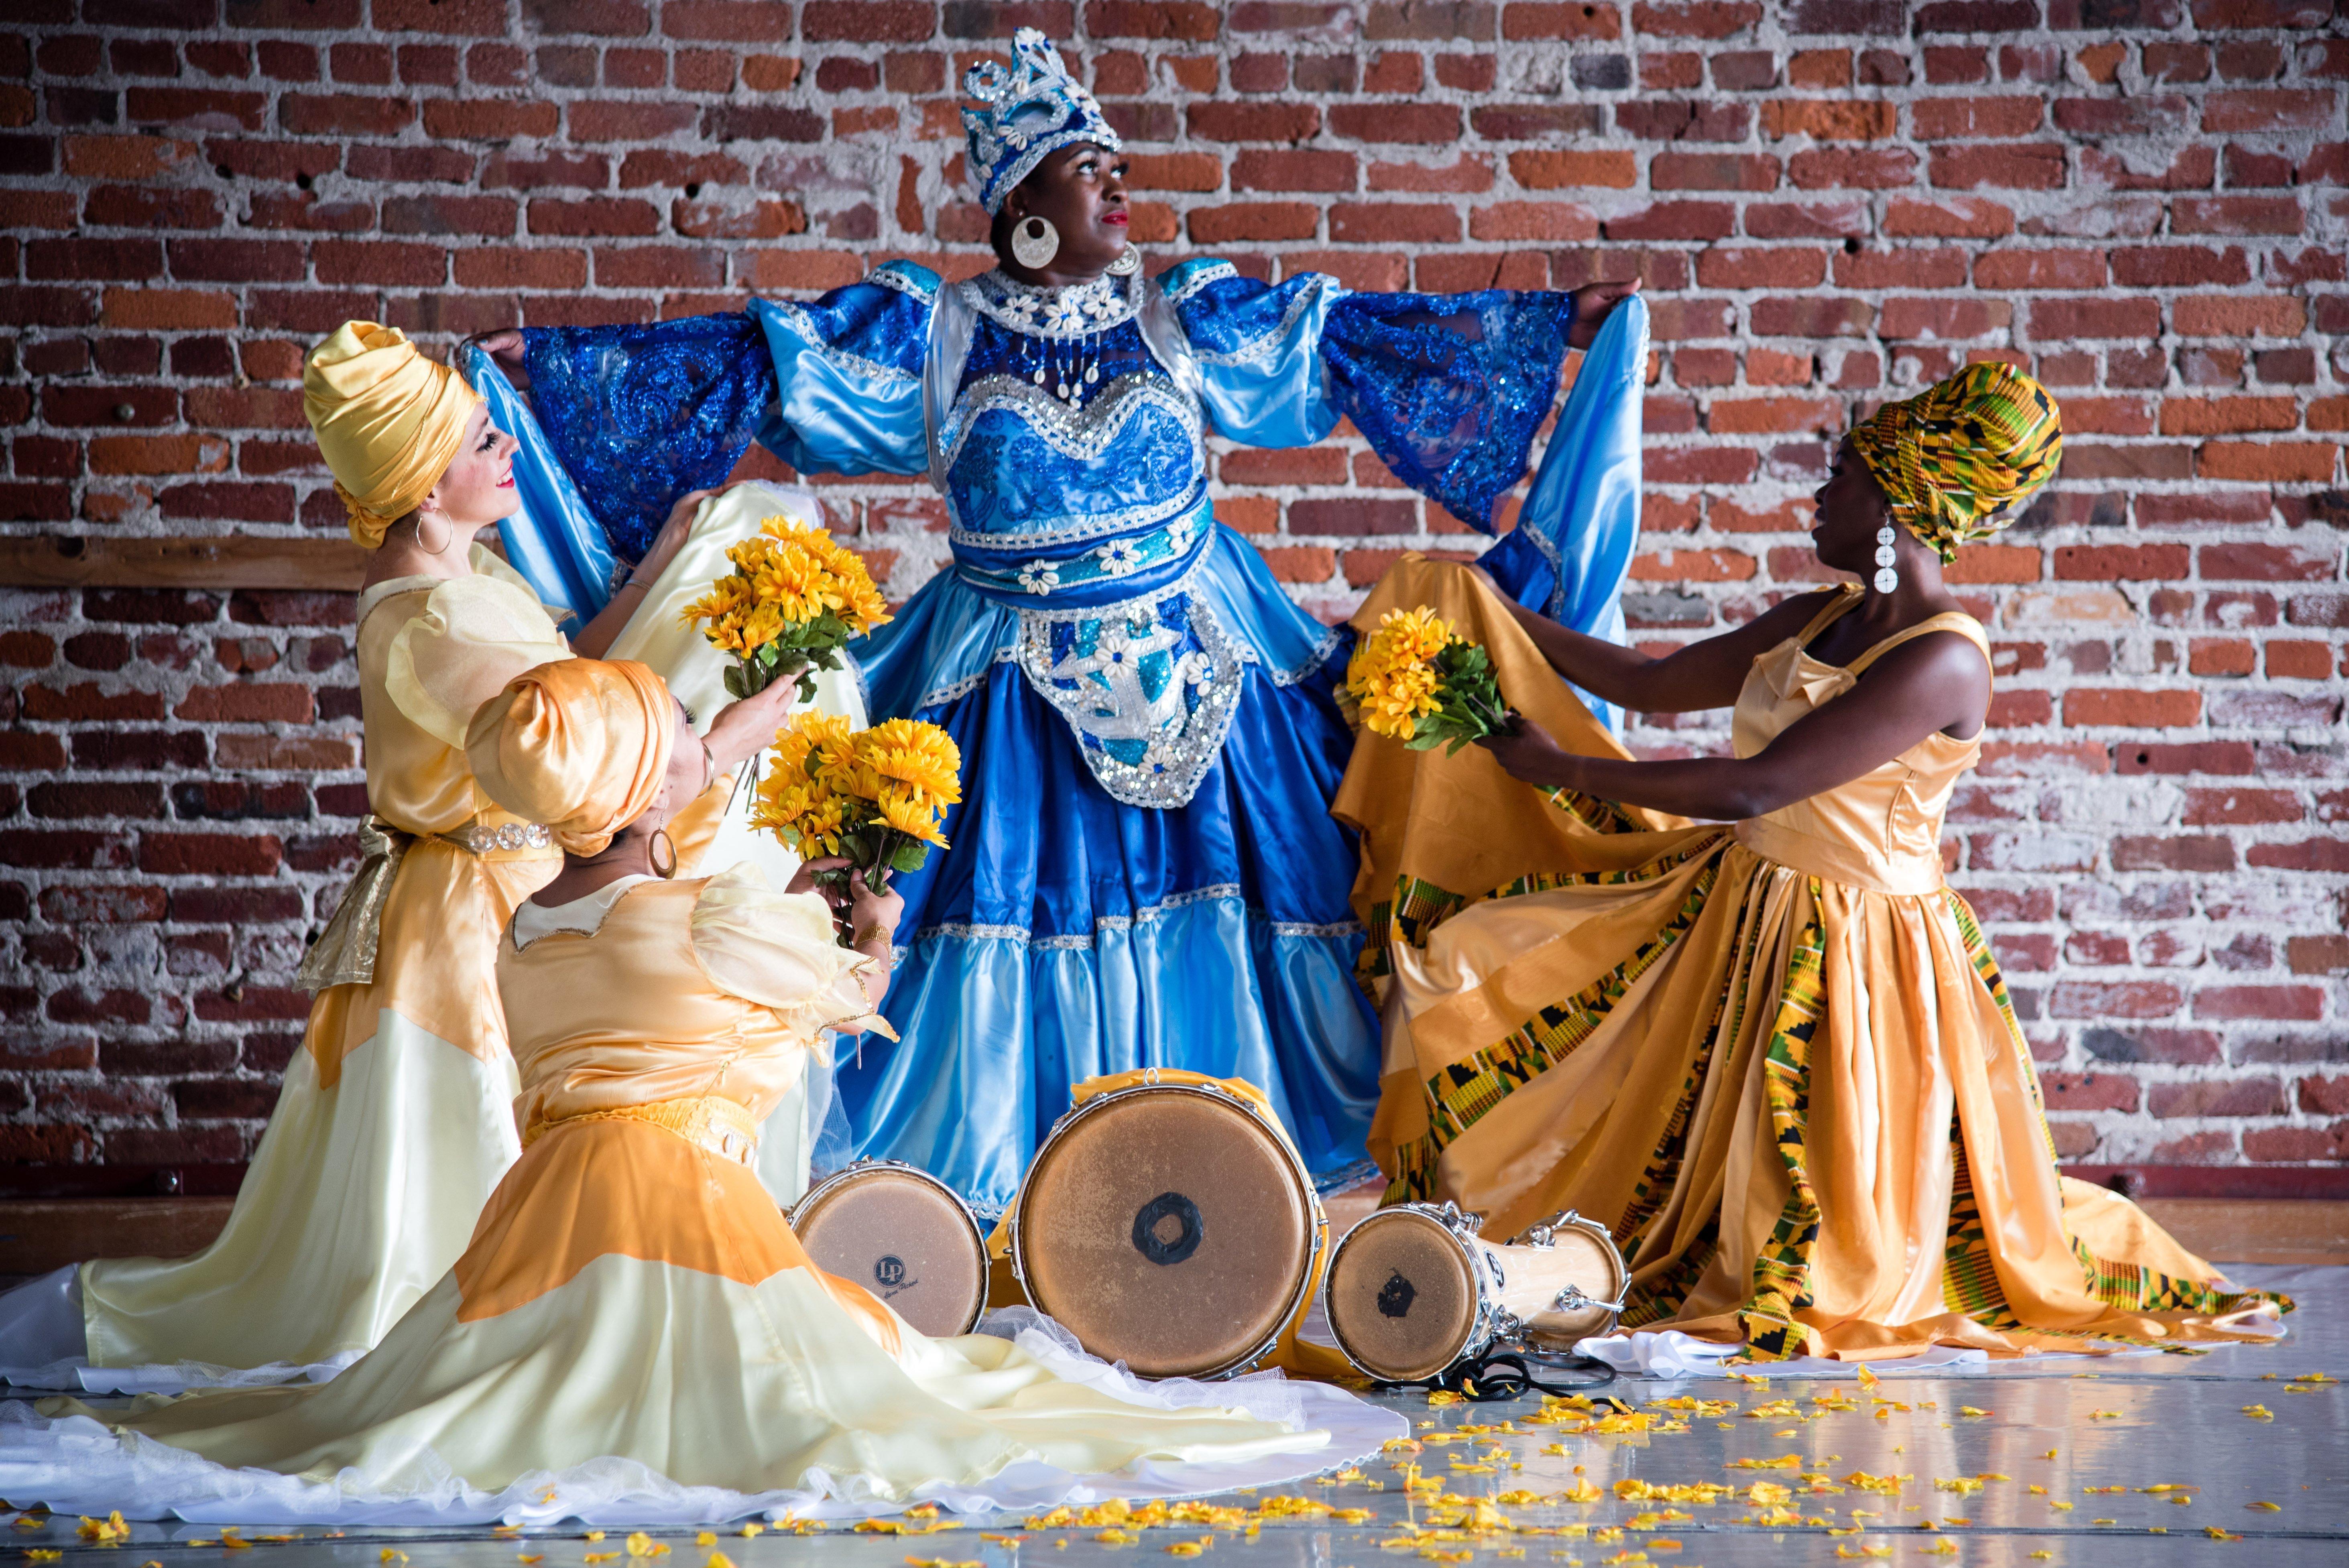 Oct 11-13: Arenas Dance Company